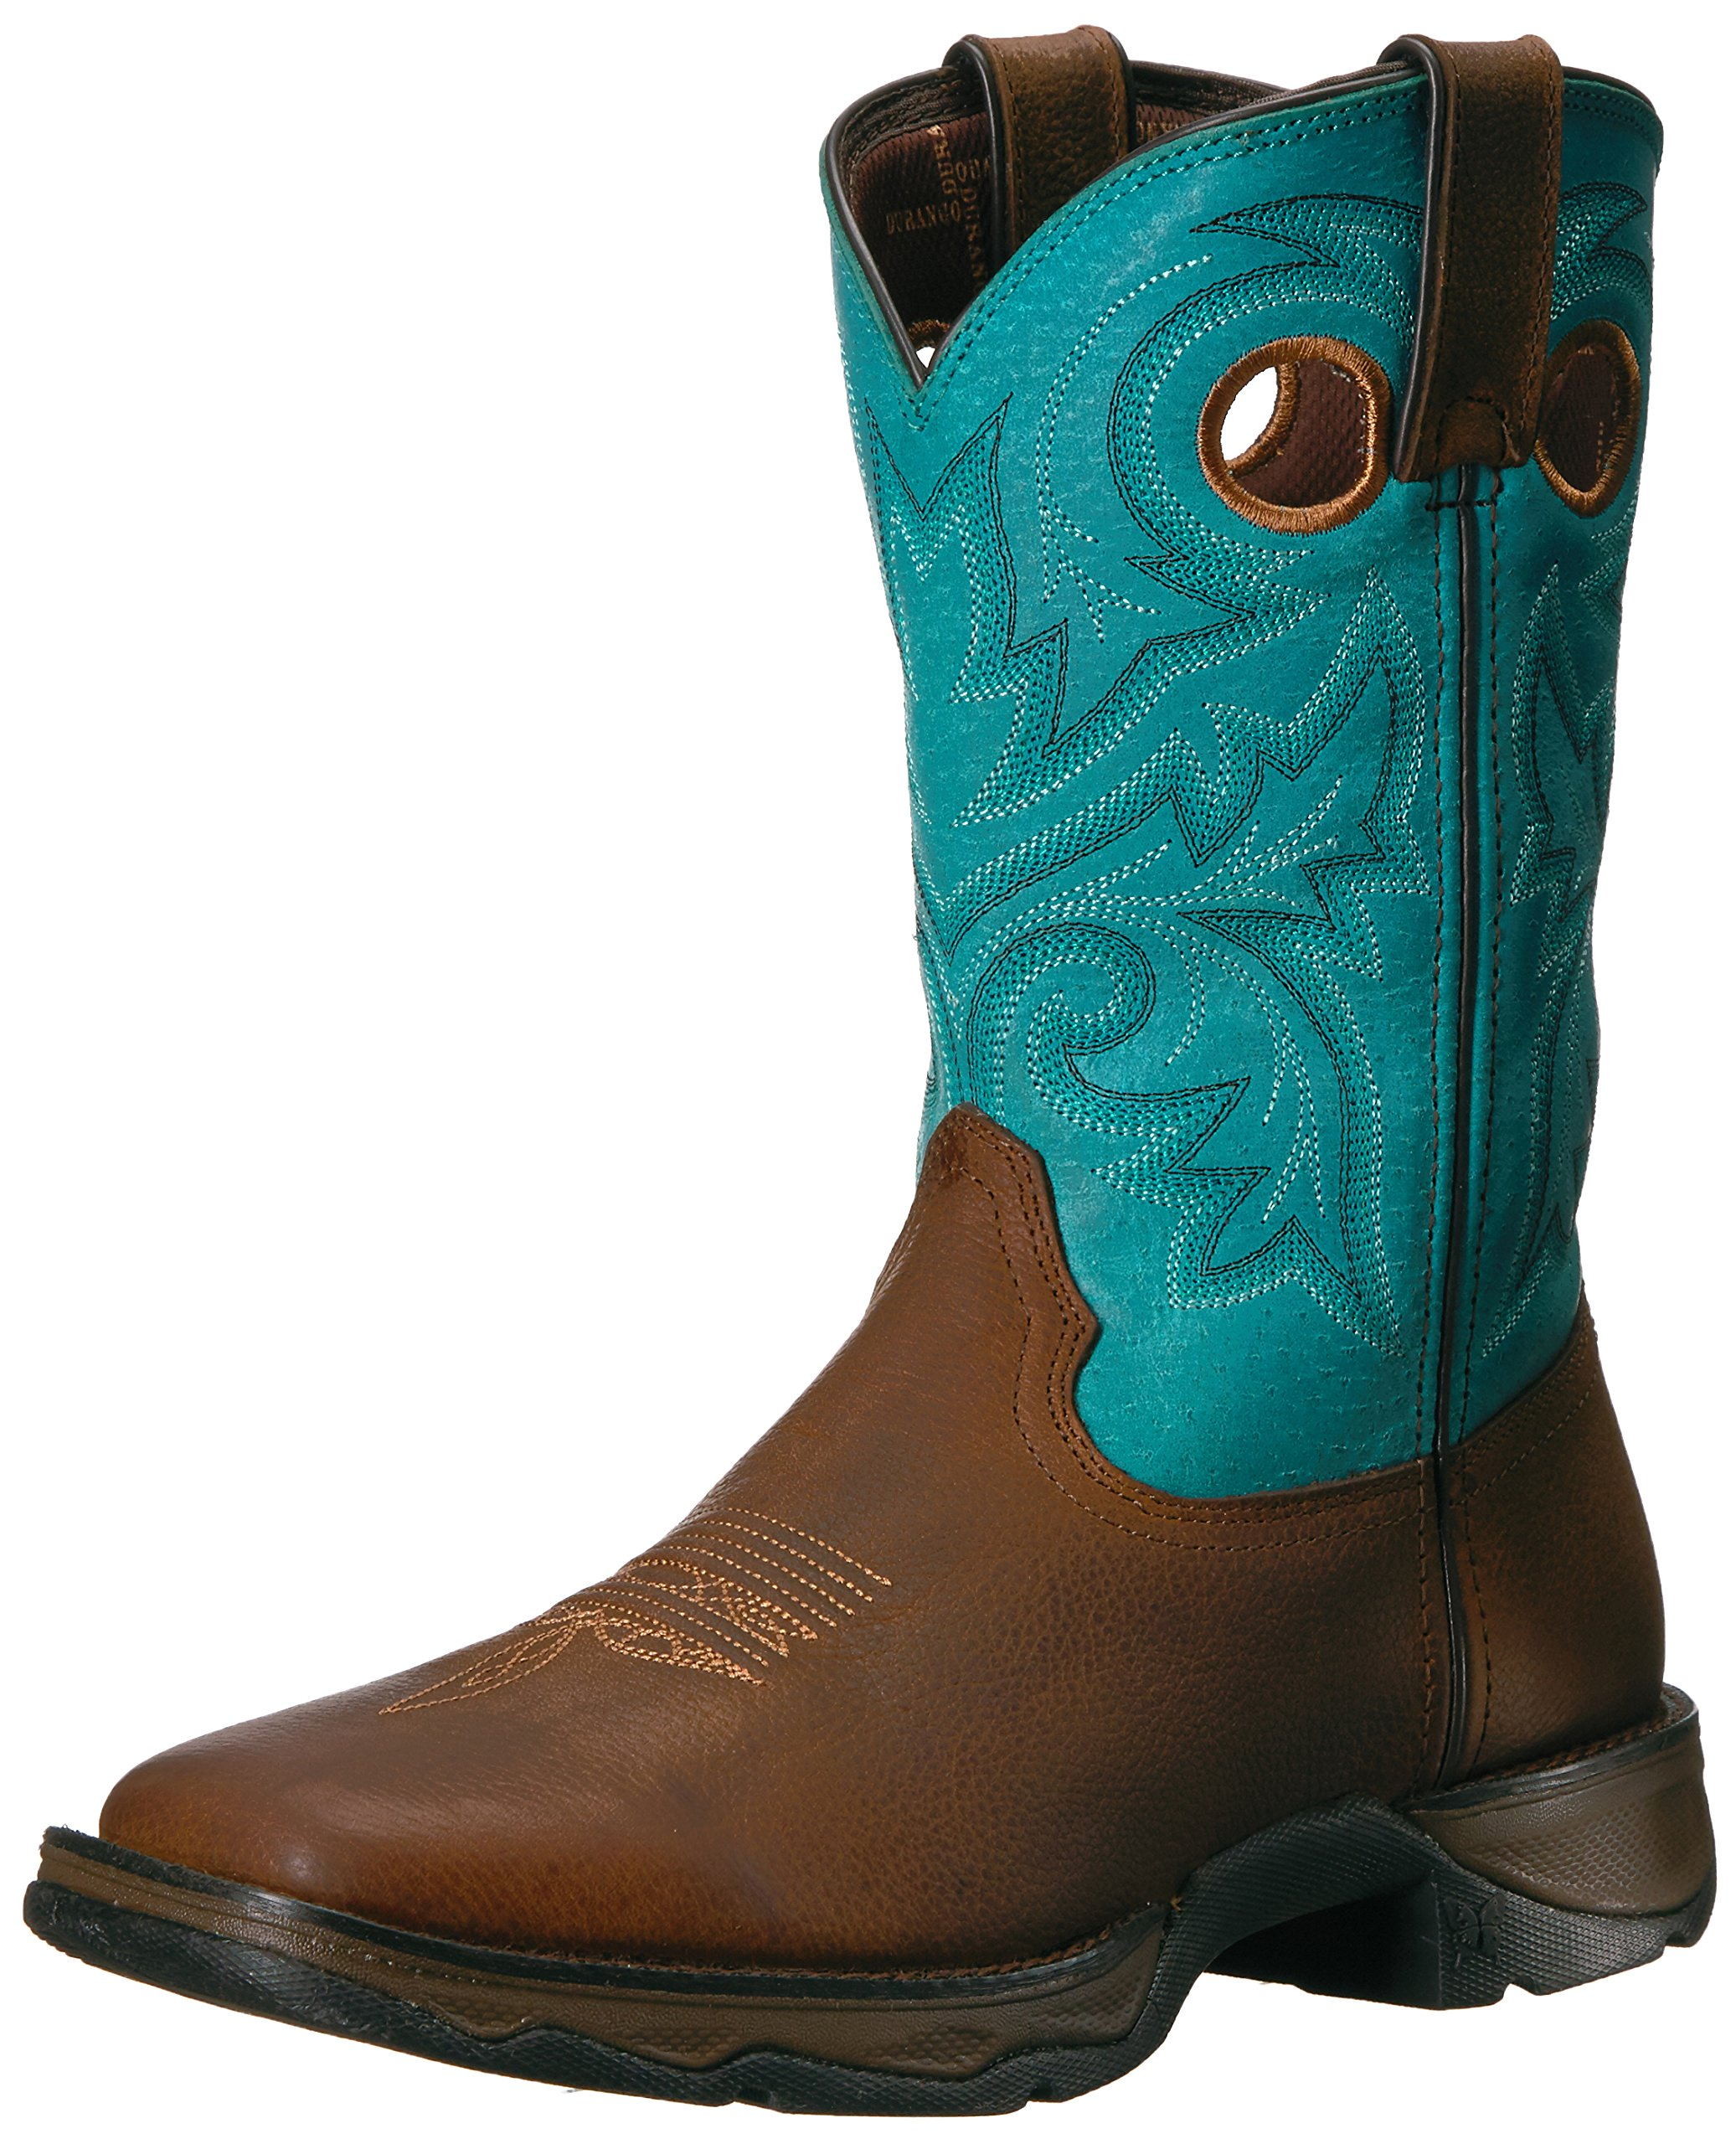 Durango Women's DWRD016 Western Boot, Brown/Turquoise, 6 M US